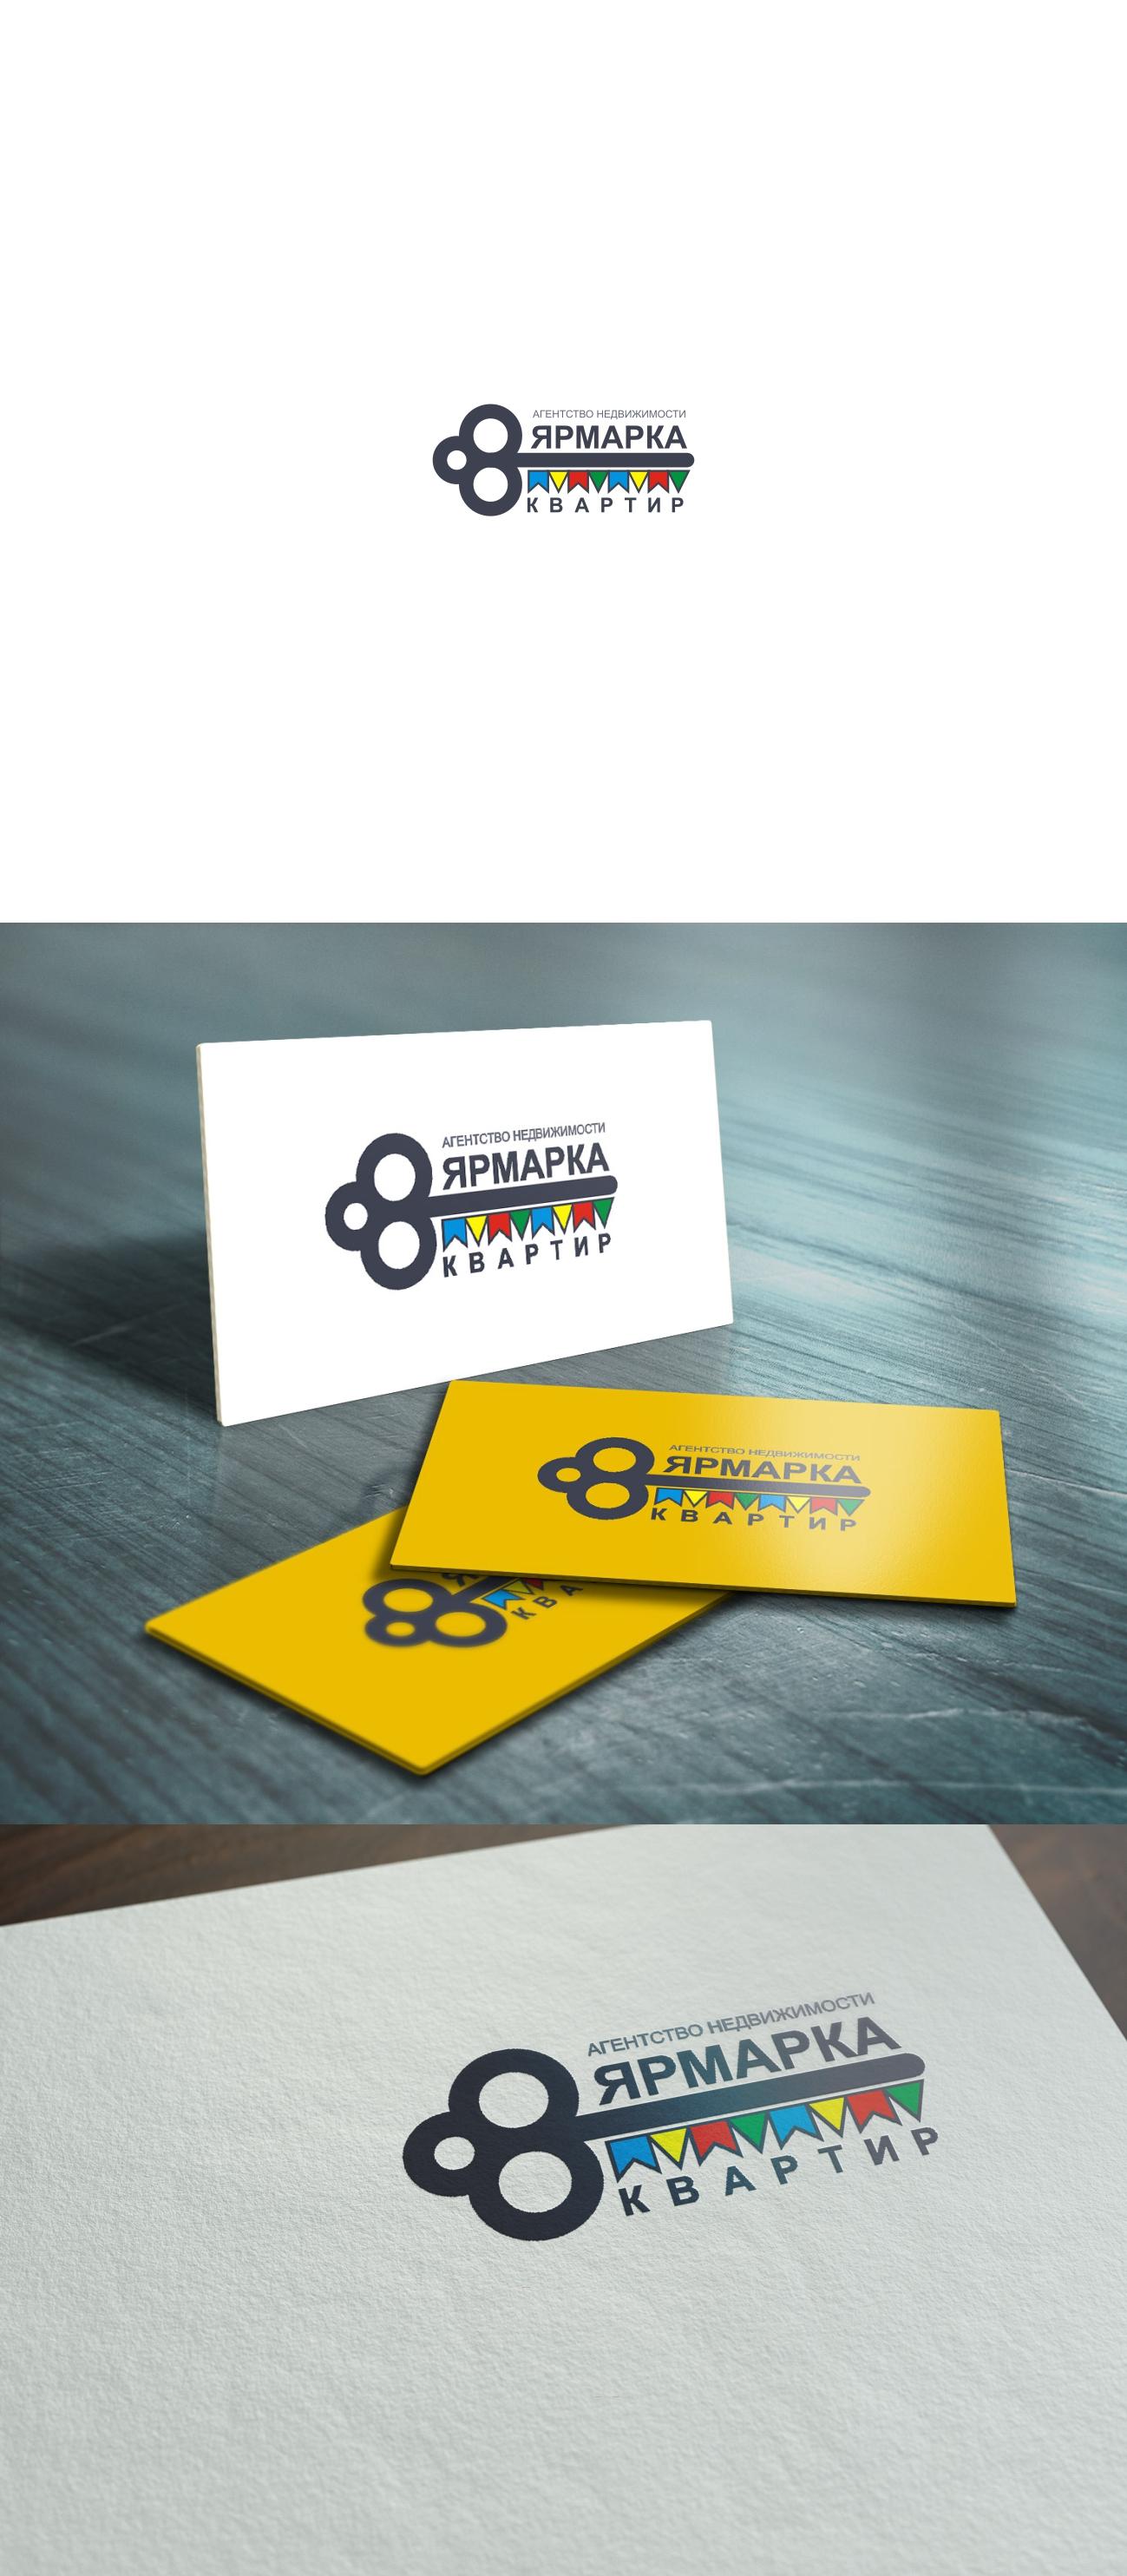 Создание логотипа, с вариантами для визитки и листовки фото f_403600808d6d6fad.jpg